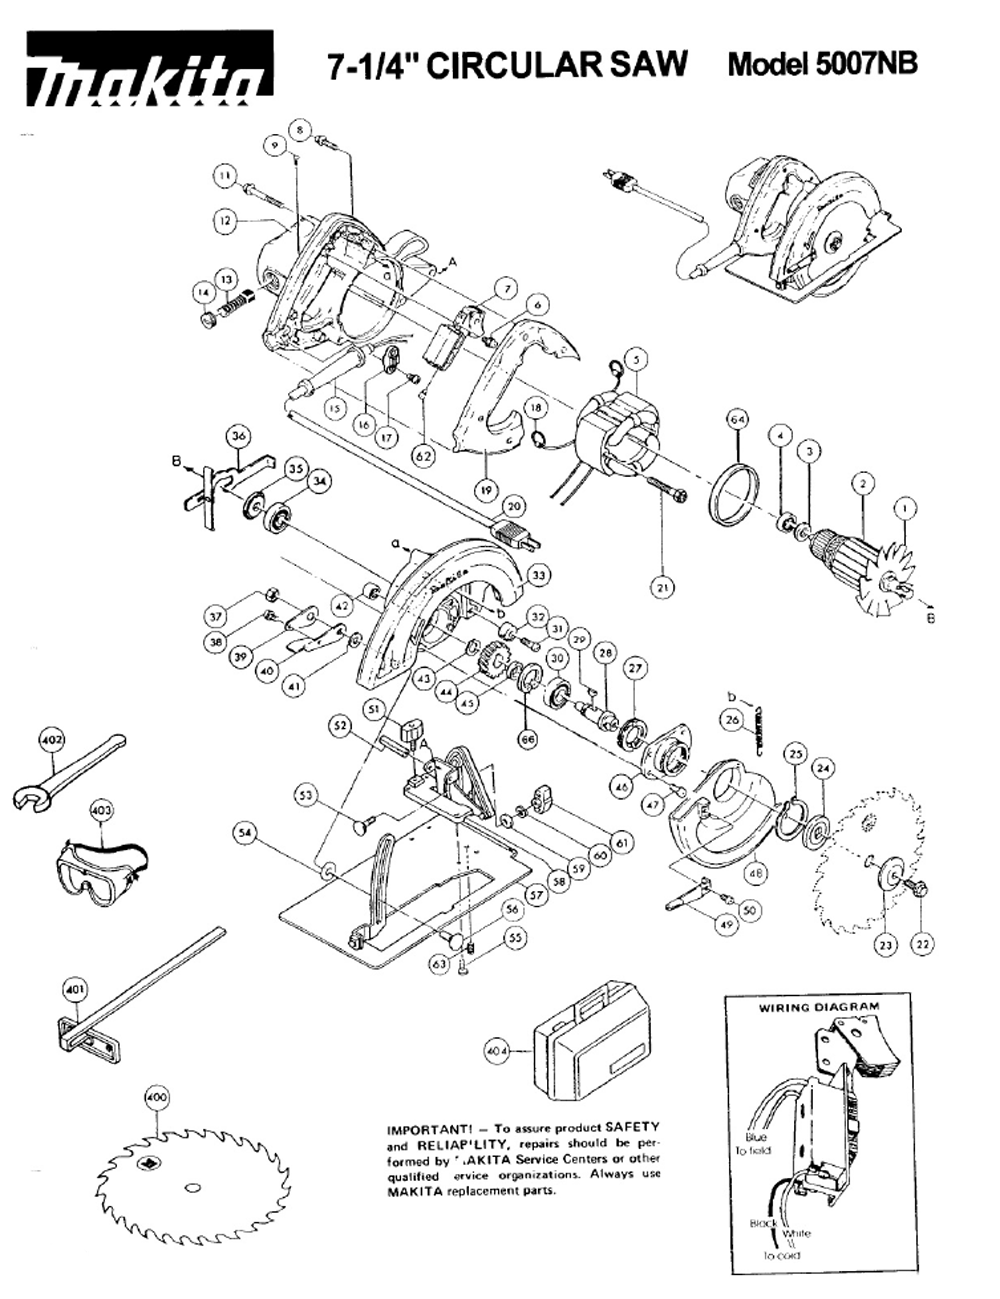 small resolution of pin by brant powell on tech illustrations electric saw makita tools makita 9227c wiring diagram makita wiring diagram